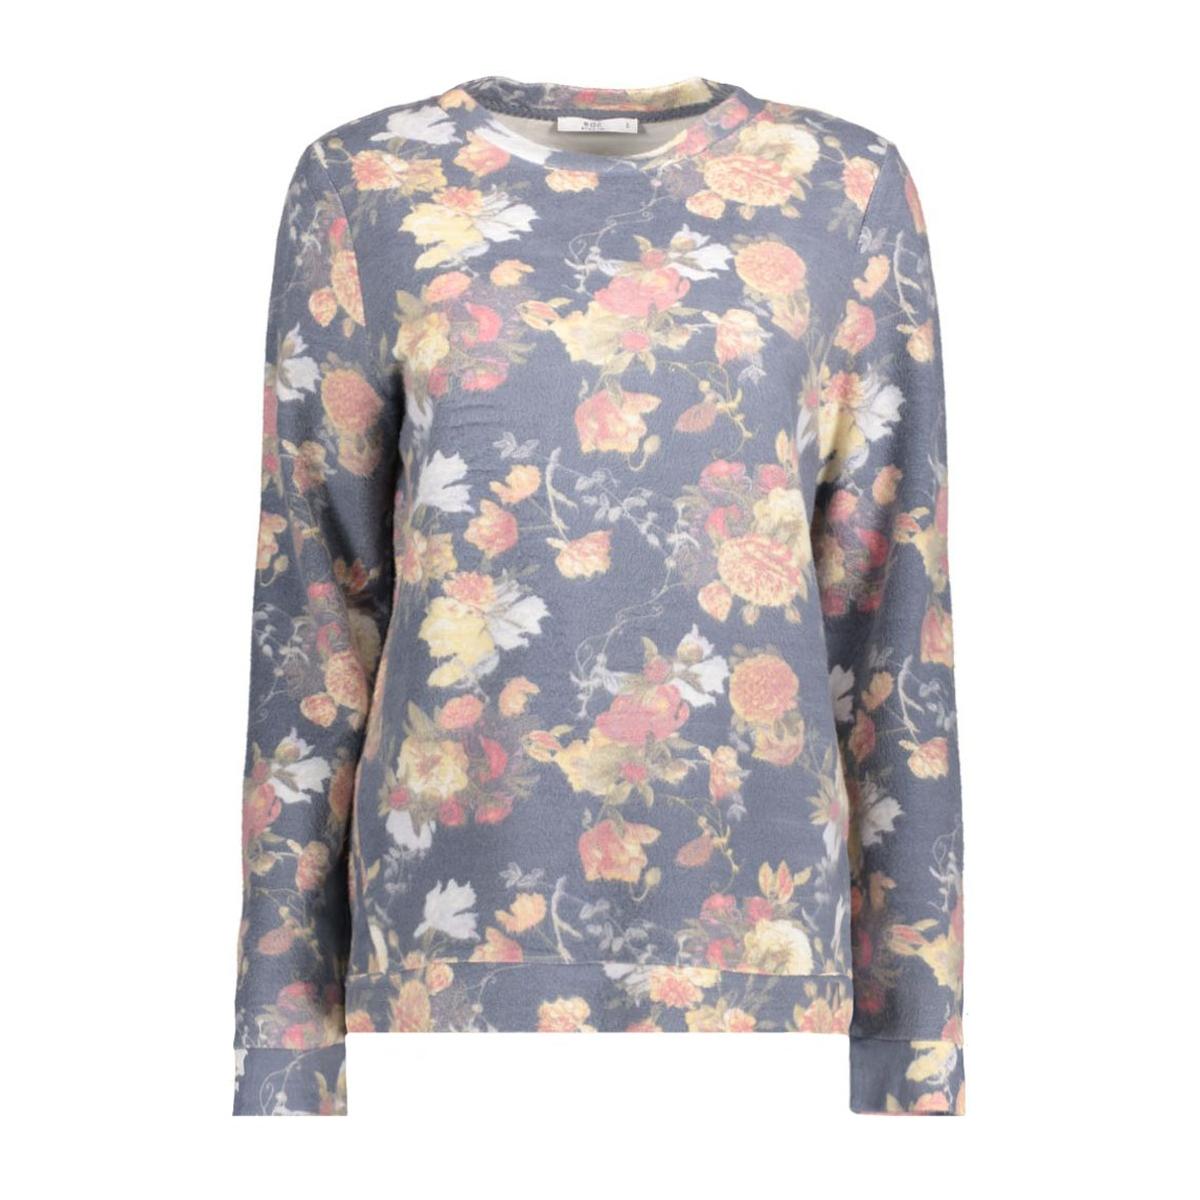 106cc1j012 edc sweater c400